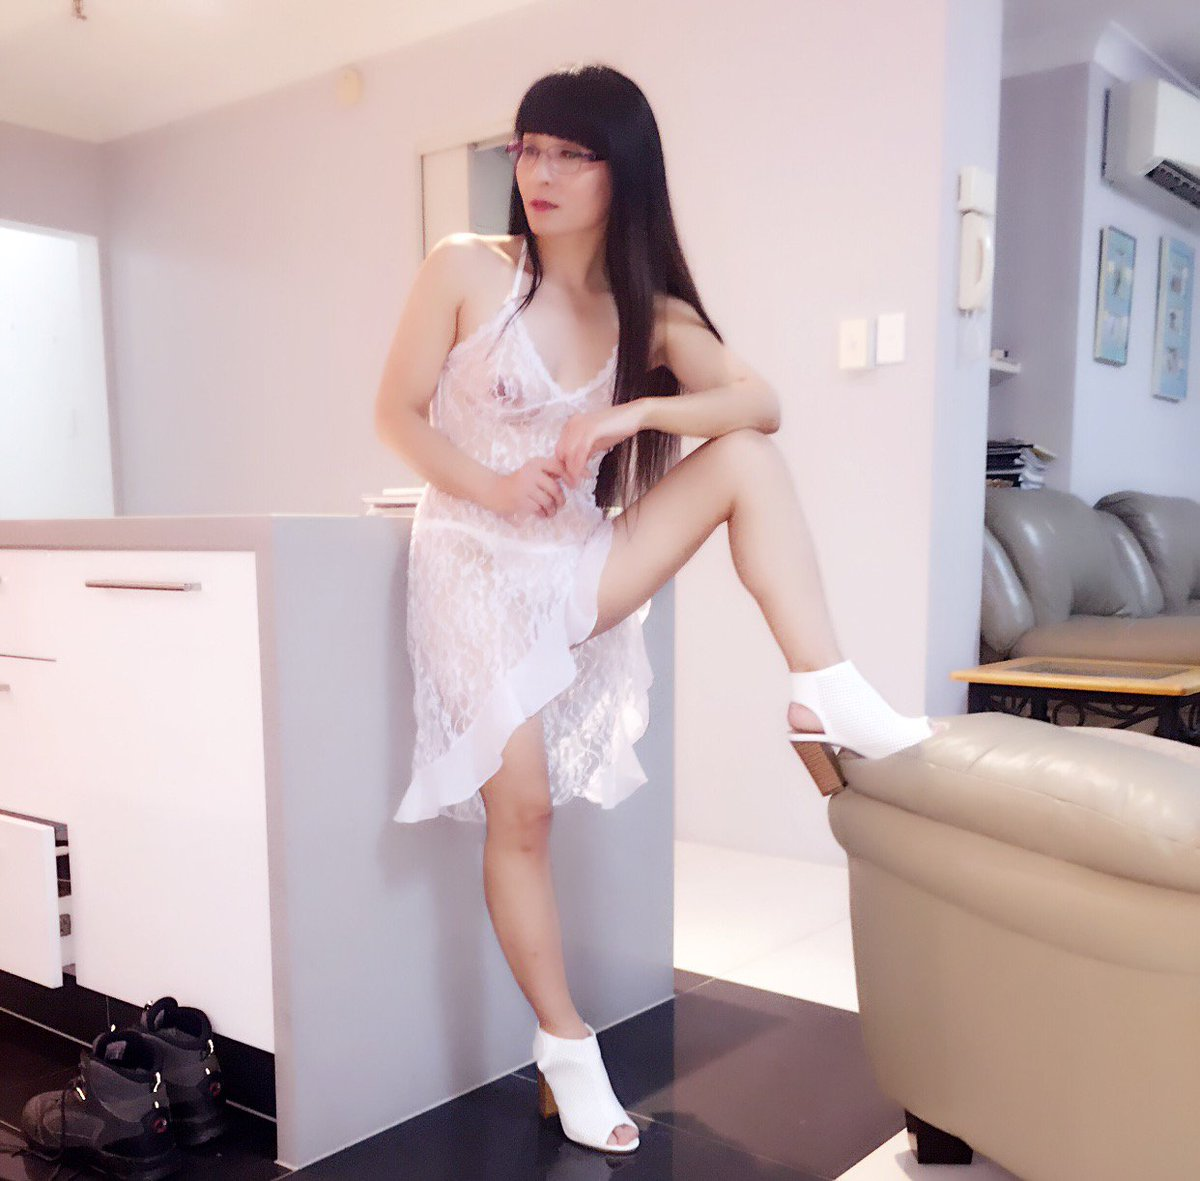 Tajvansko dekle v Brisbaneu - Babes - Video Xxx-8610